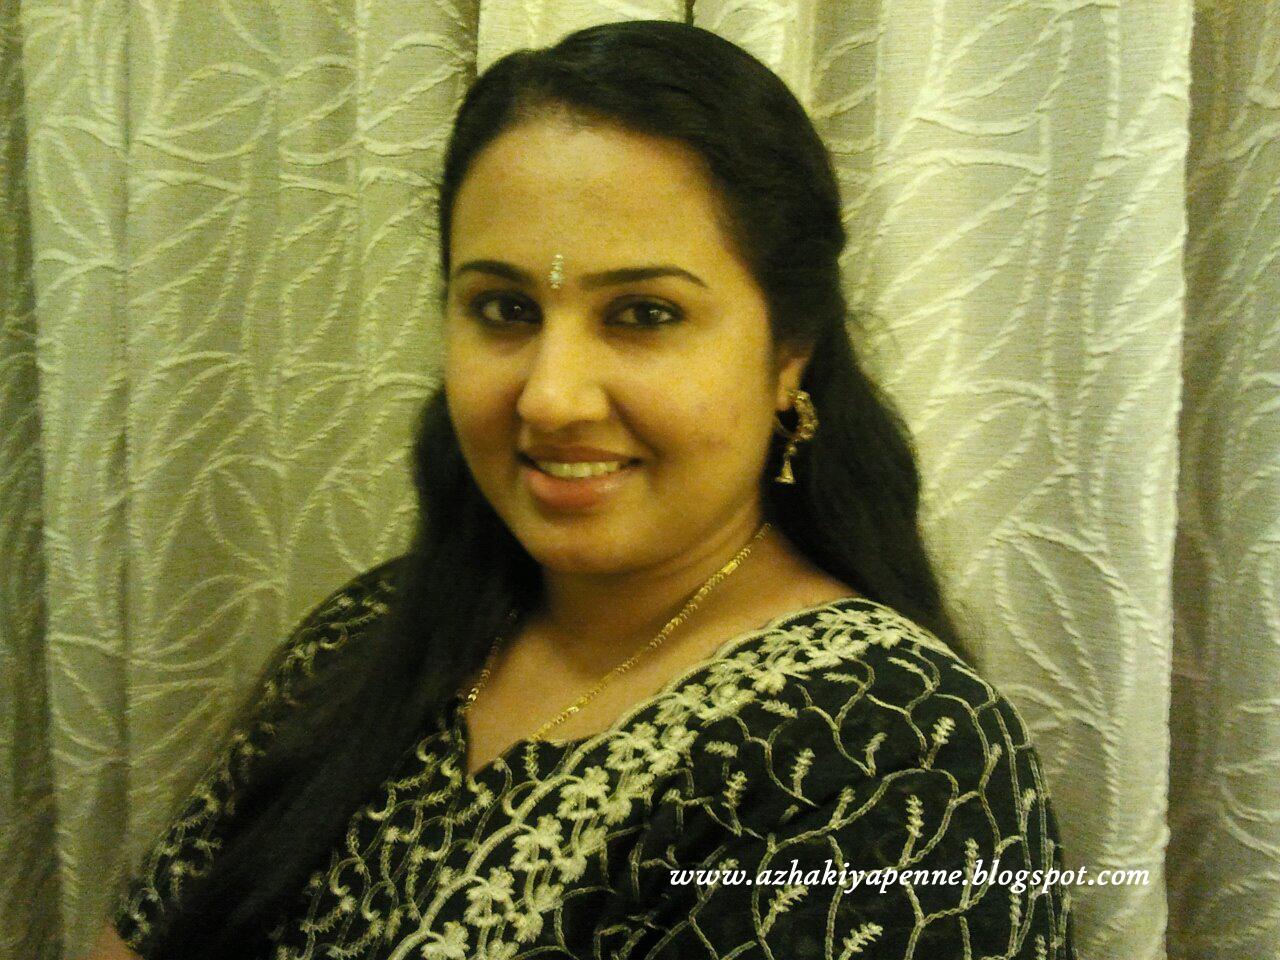 Download Girl Wallpaper Nokia 5233 Soo Cool Pics Hot Hollywood 2013 Marathi Actress